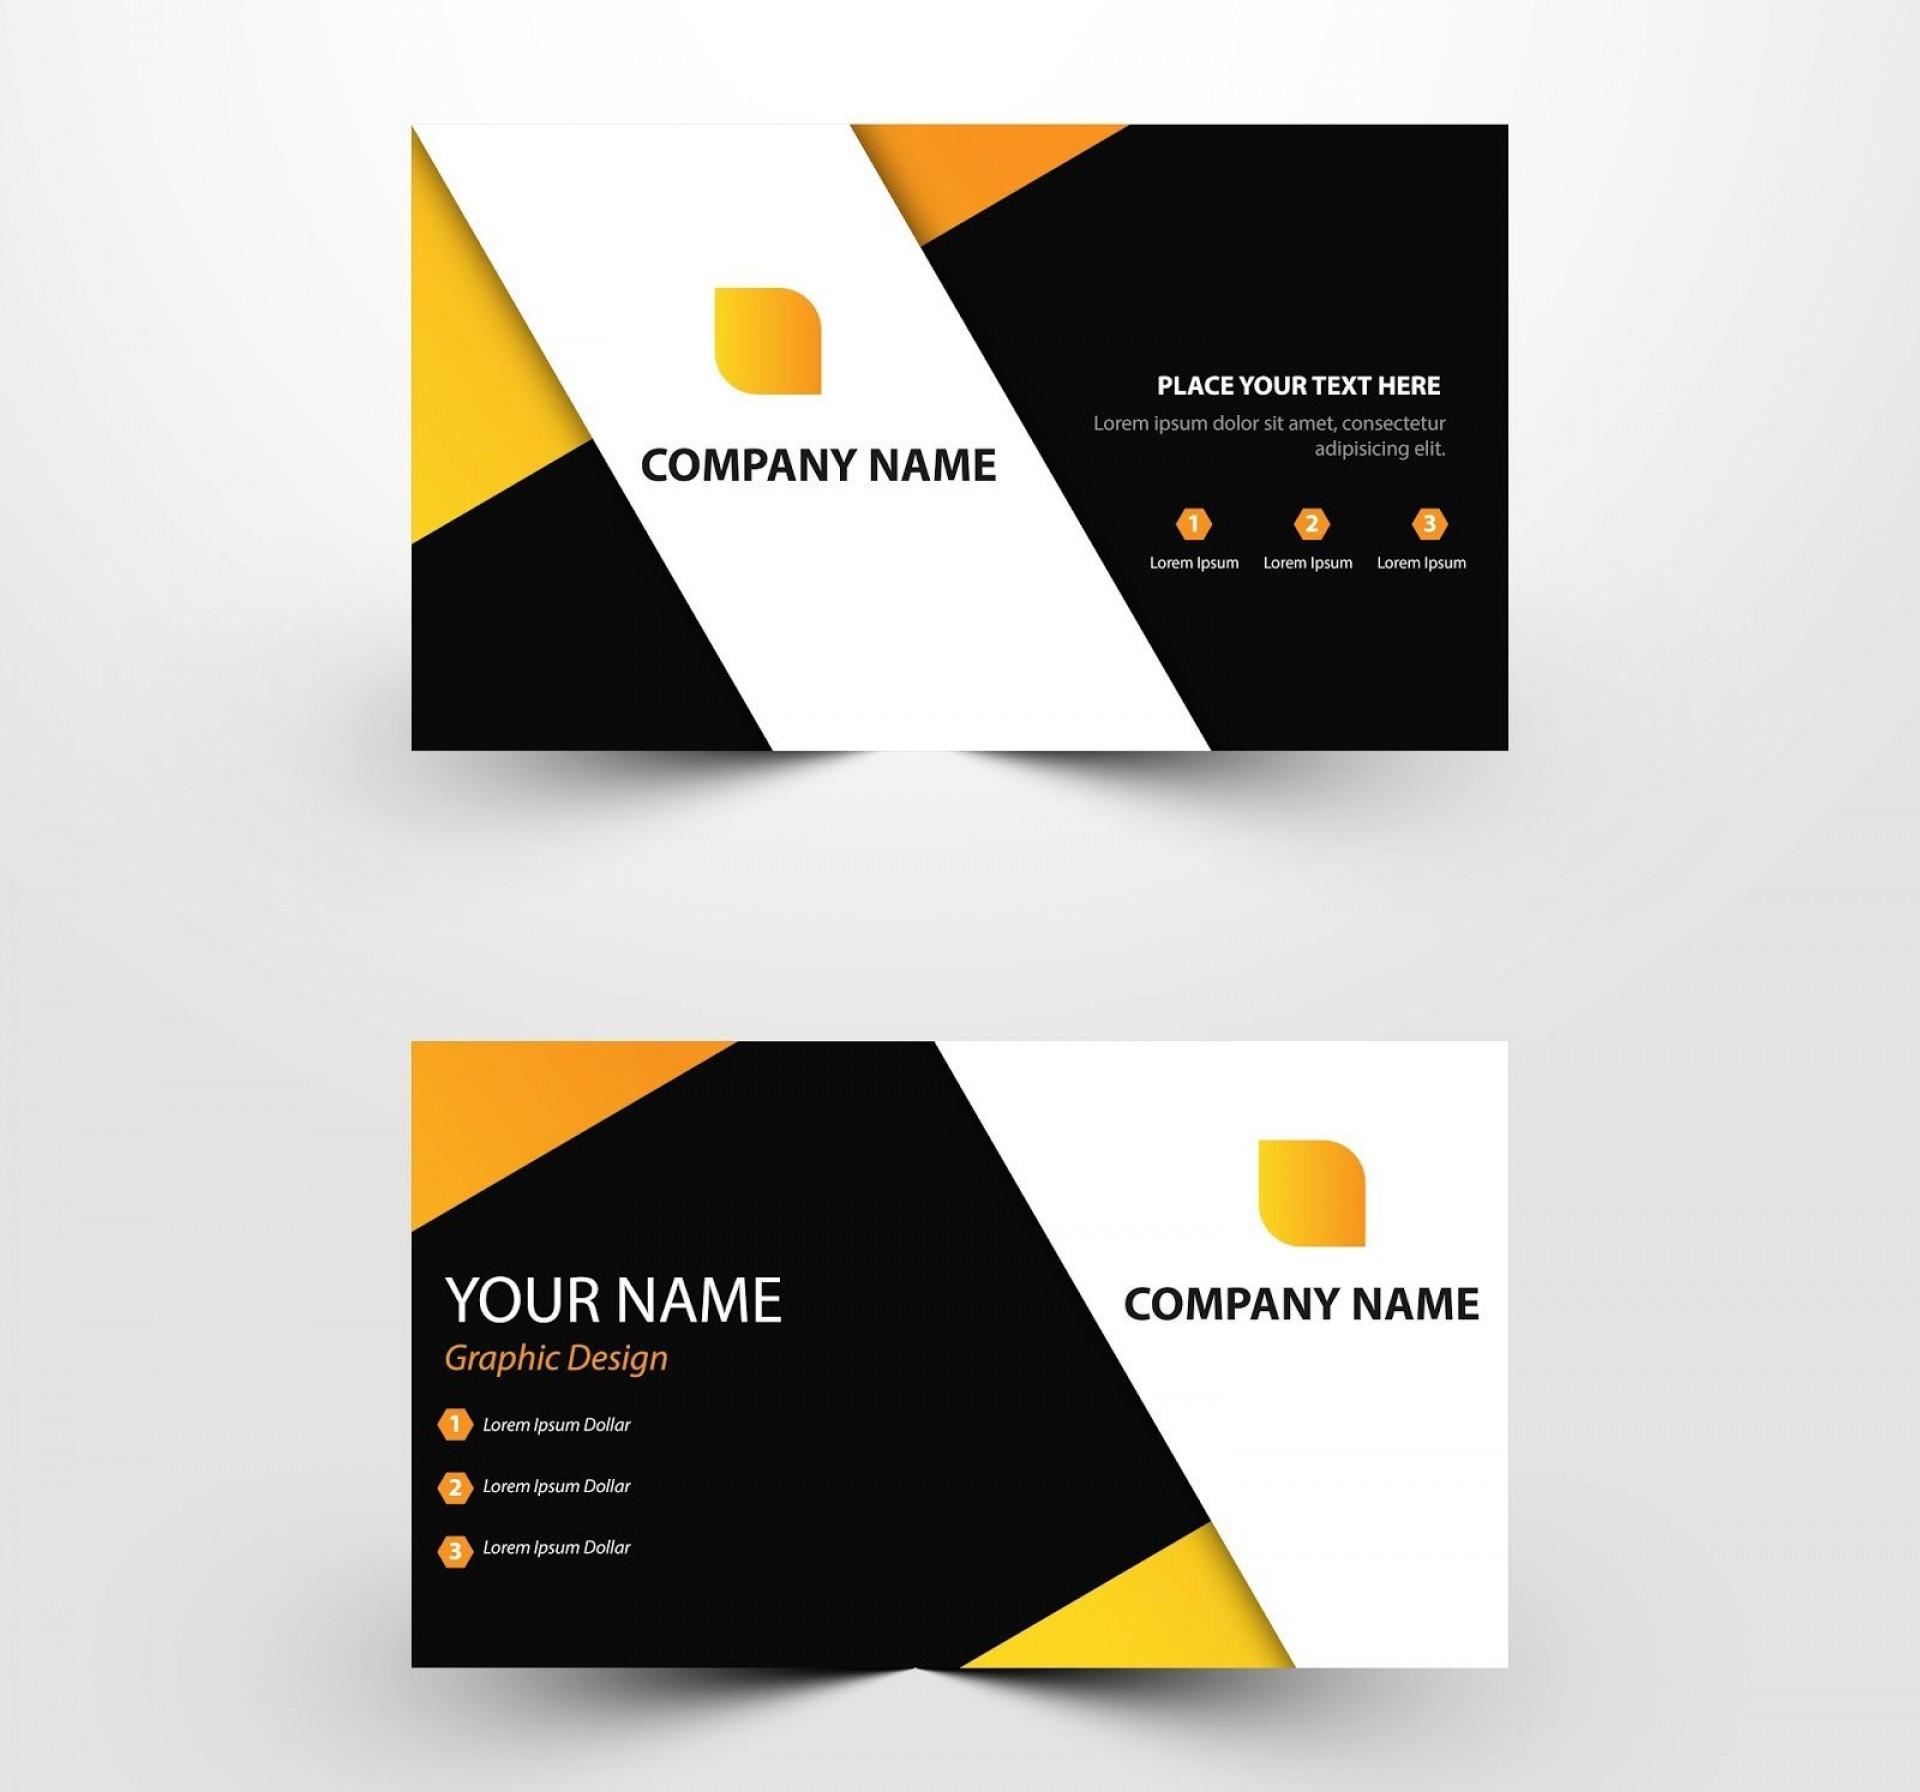 010 Impressive Simple Visiting Card Design Psd File Free Download Concept 1920